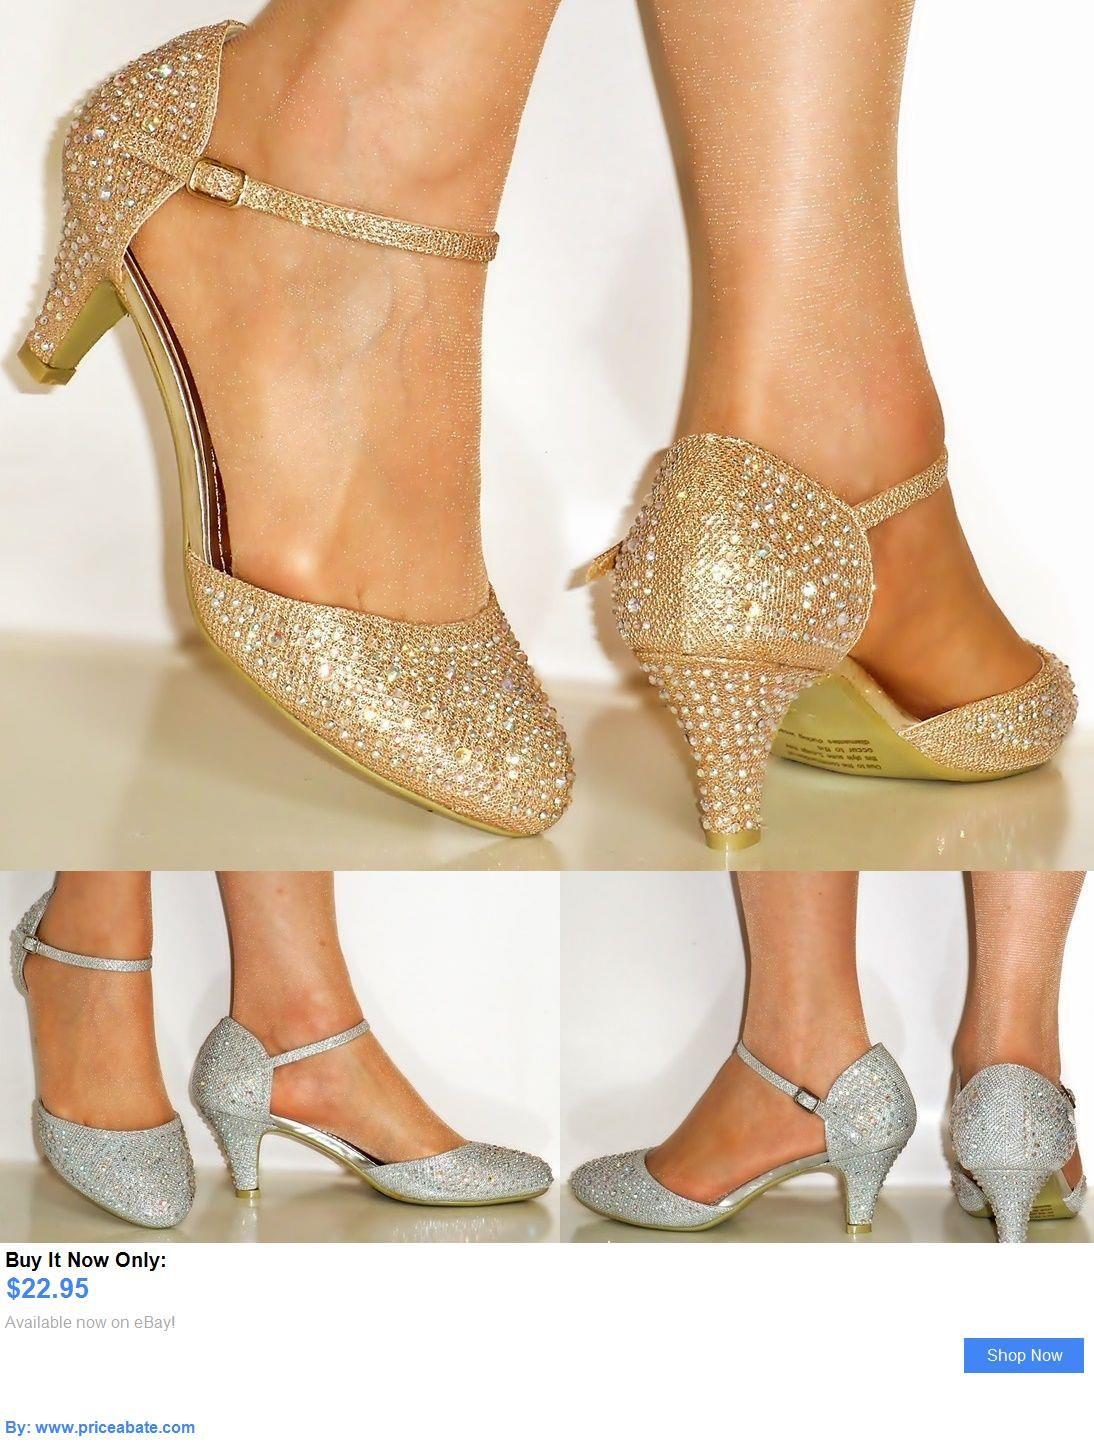 Ladies Womens Low Block Heel Party Bridal Glitter Sandals Wedding Prom Shoes Sz